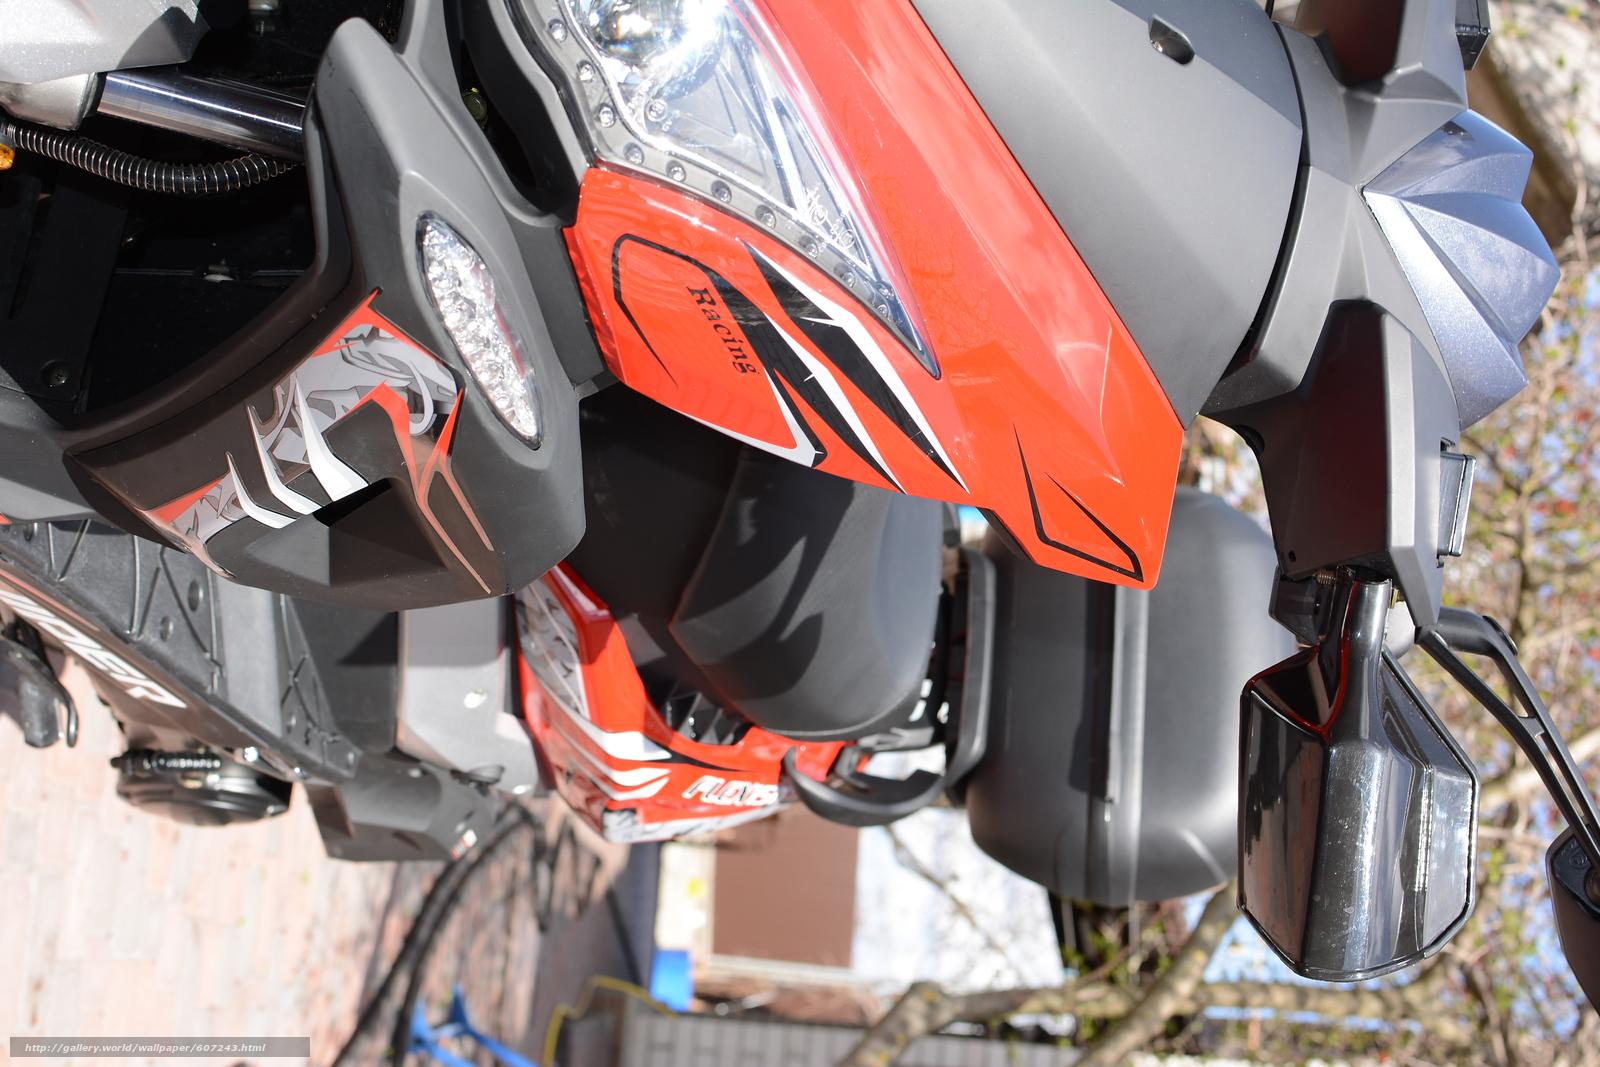 Скачать на телефон обои фото картинку на тему VIPER FLEX VP150M, скутер, мотороллер, разширение 6000x4000